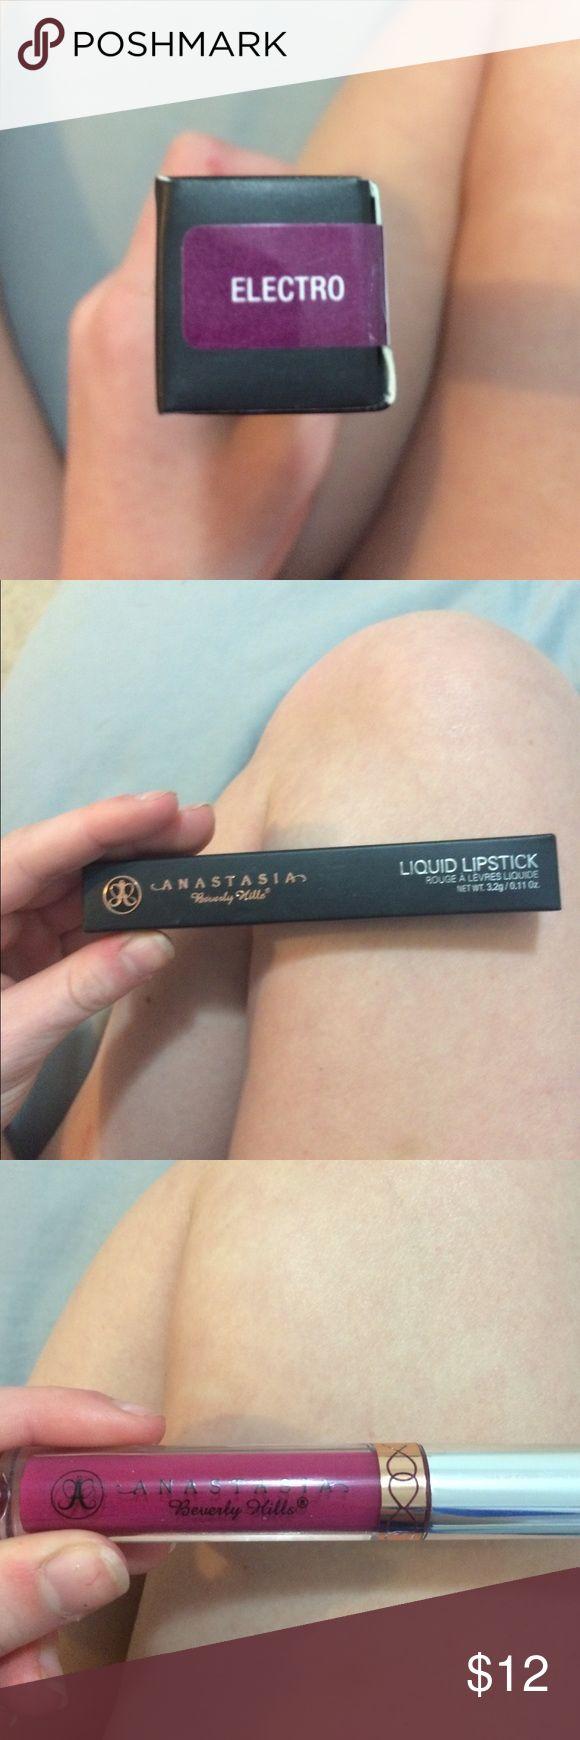 ABH liquid lipstick in Lovely | Abh liquid lipstick